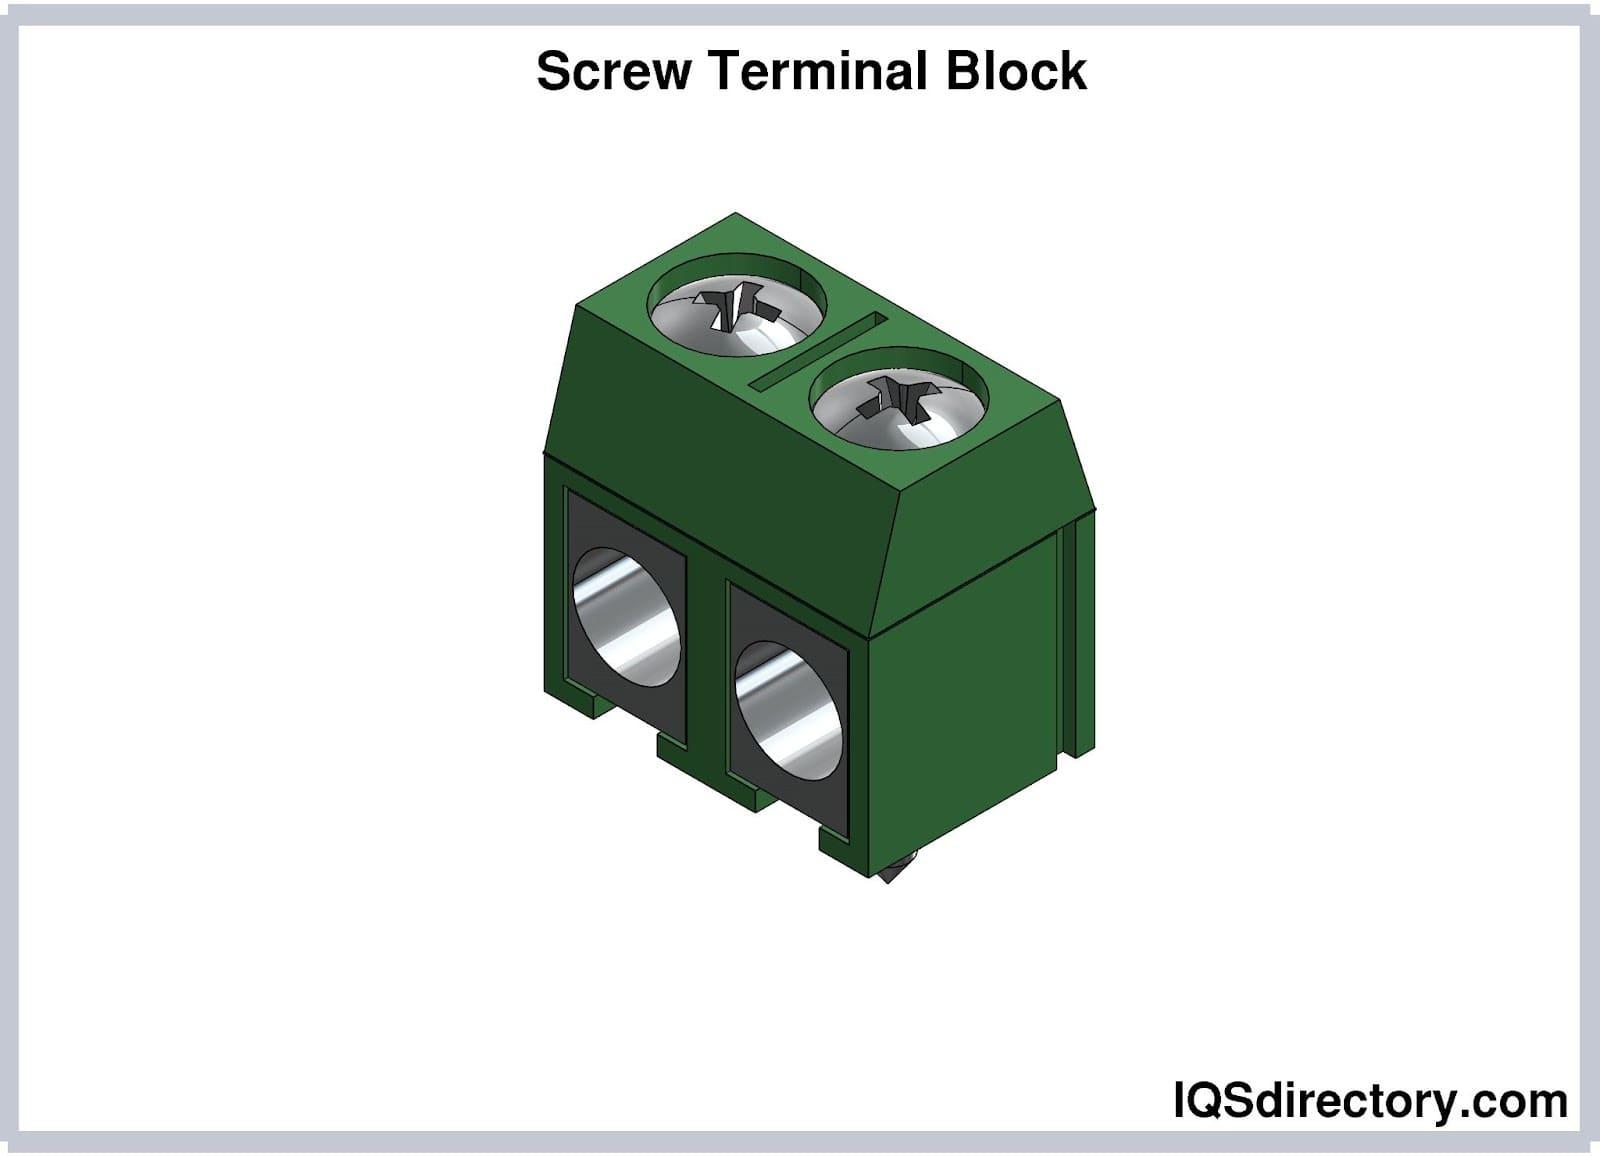 Screw Terminal Block